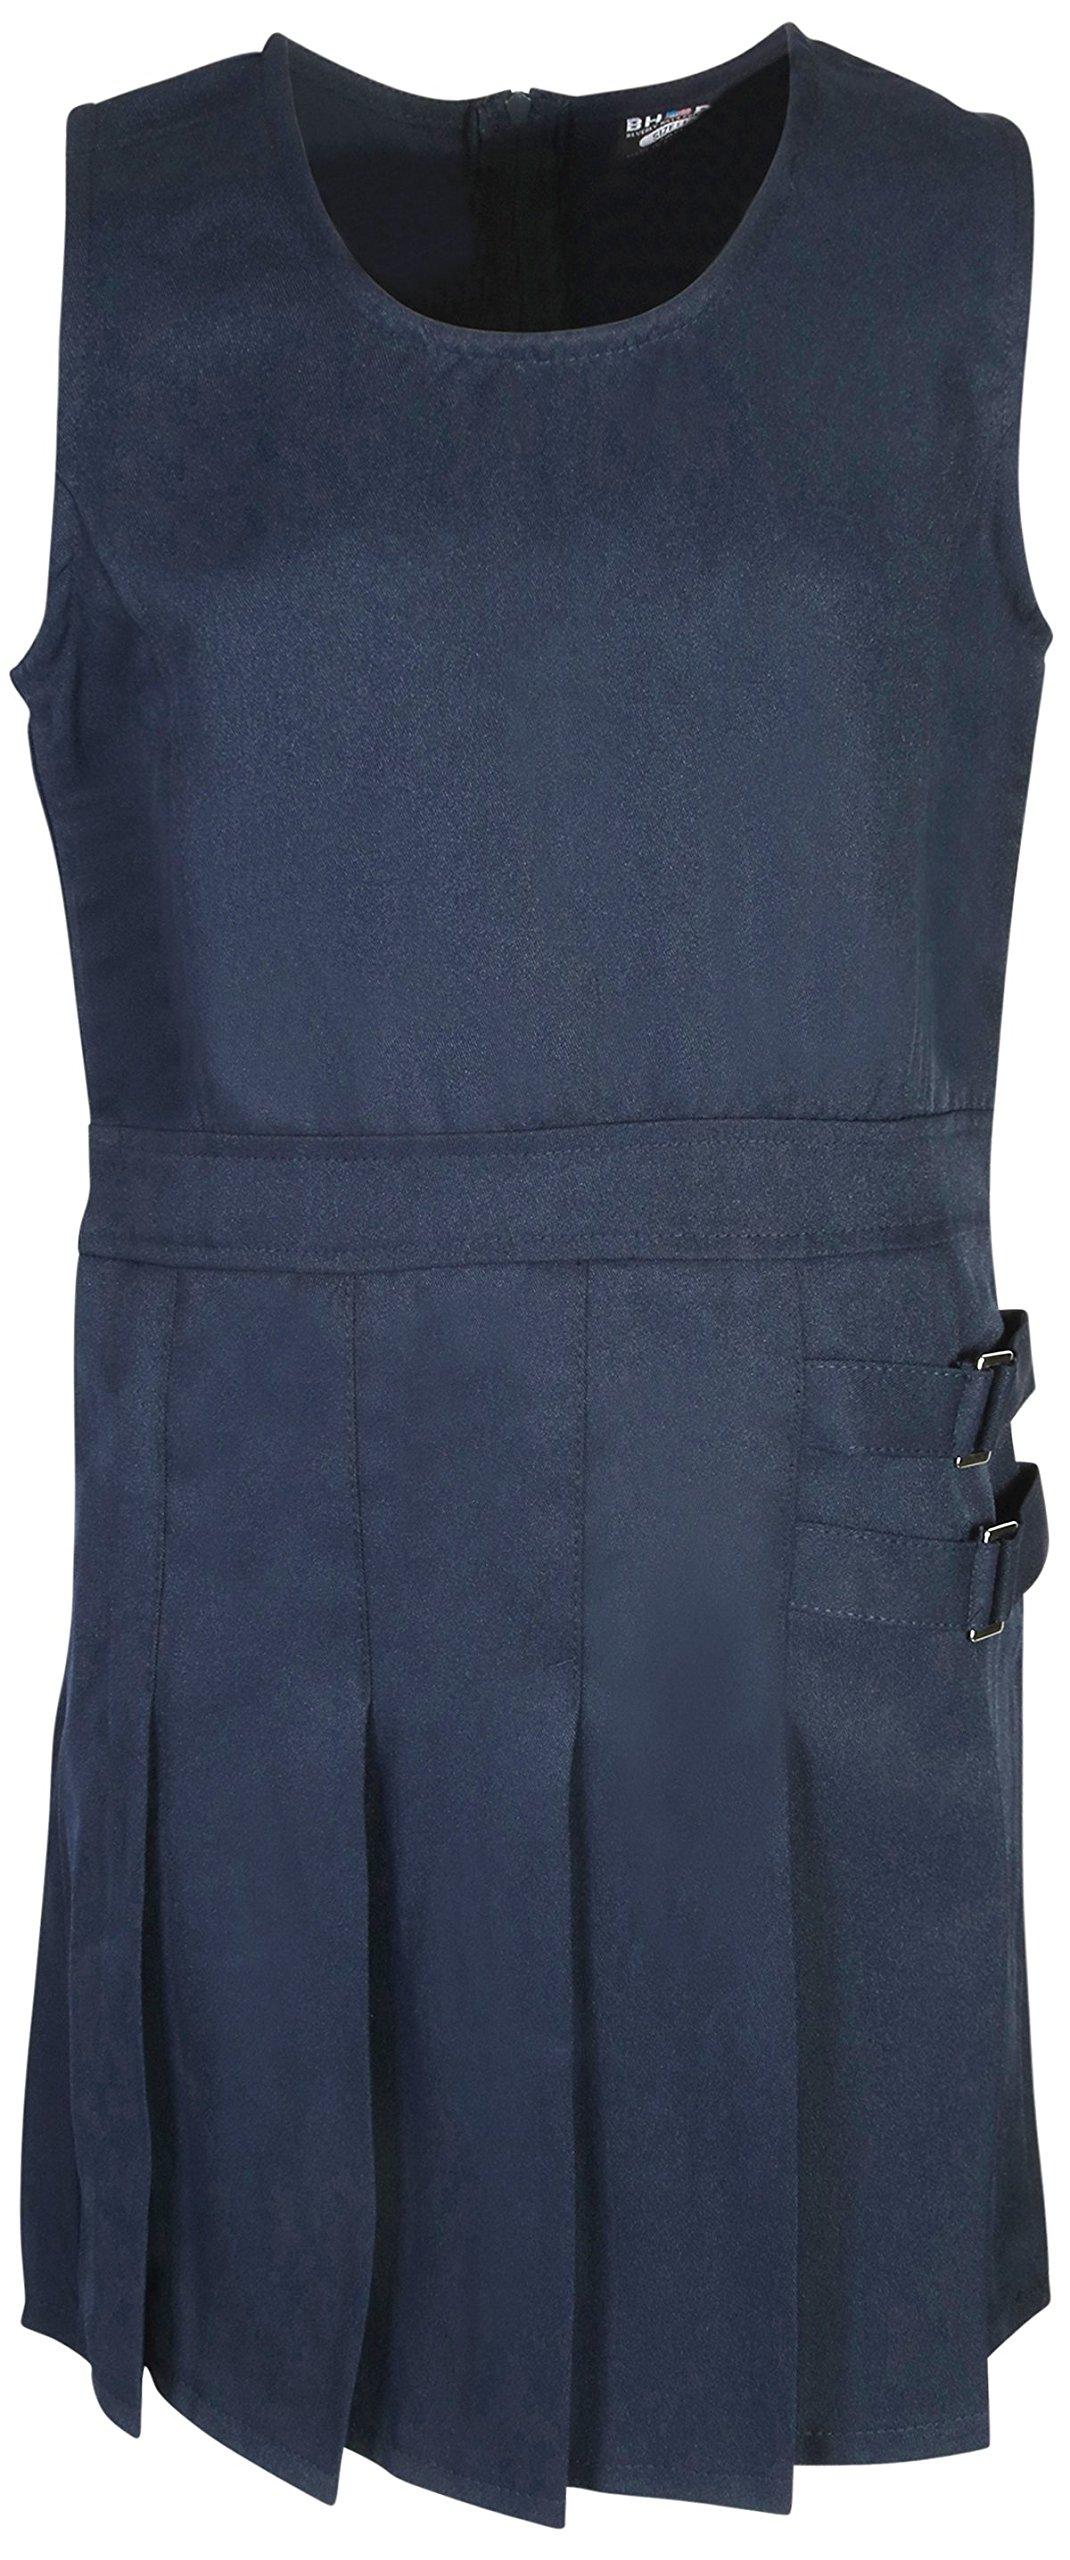 Beverly Hills Polo Club Girls School Uniform Pleated Twill V-Neck Jumper, Navy, Size 7'